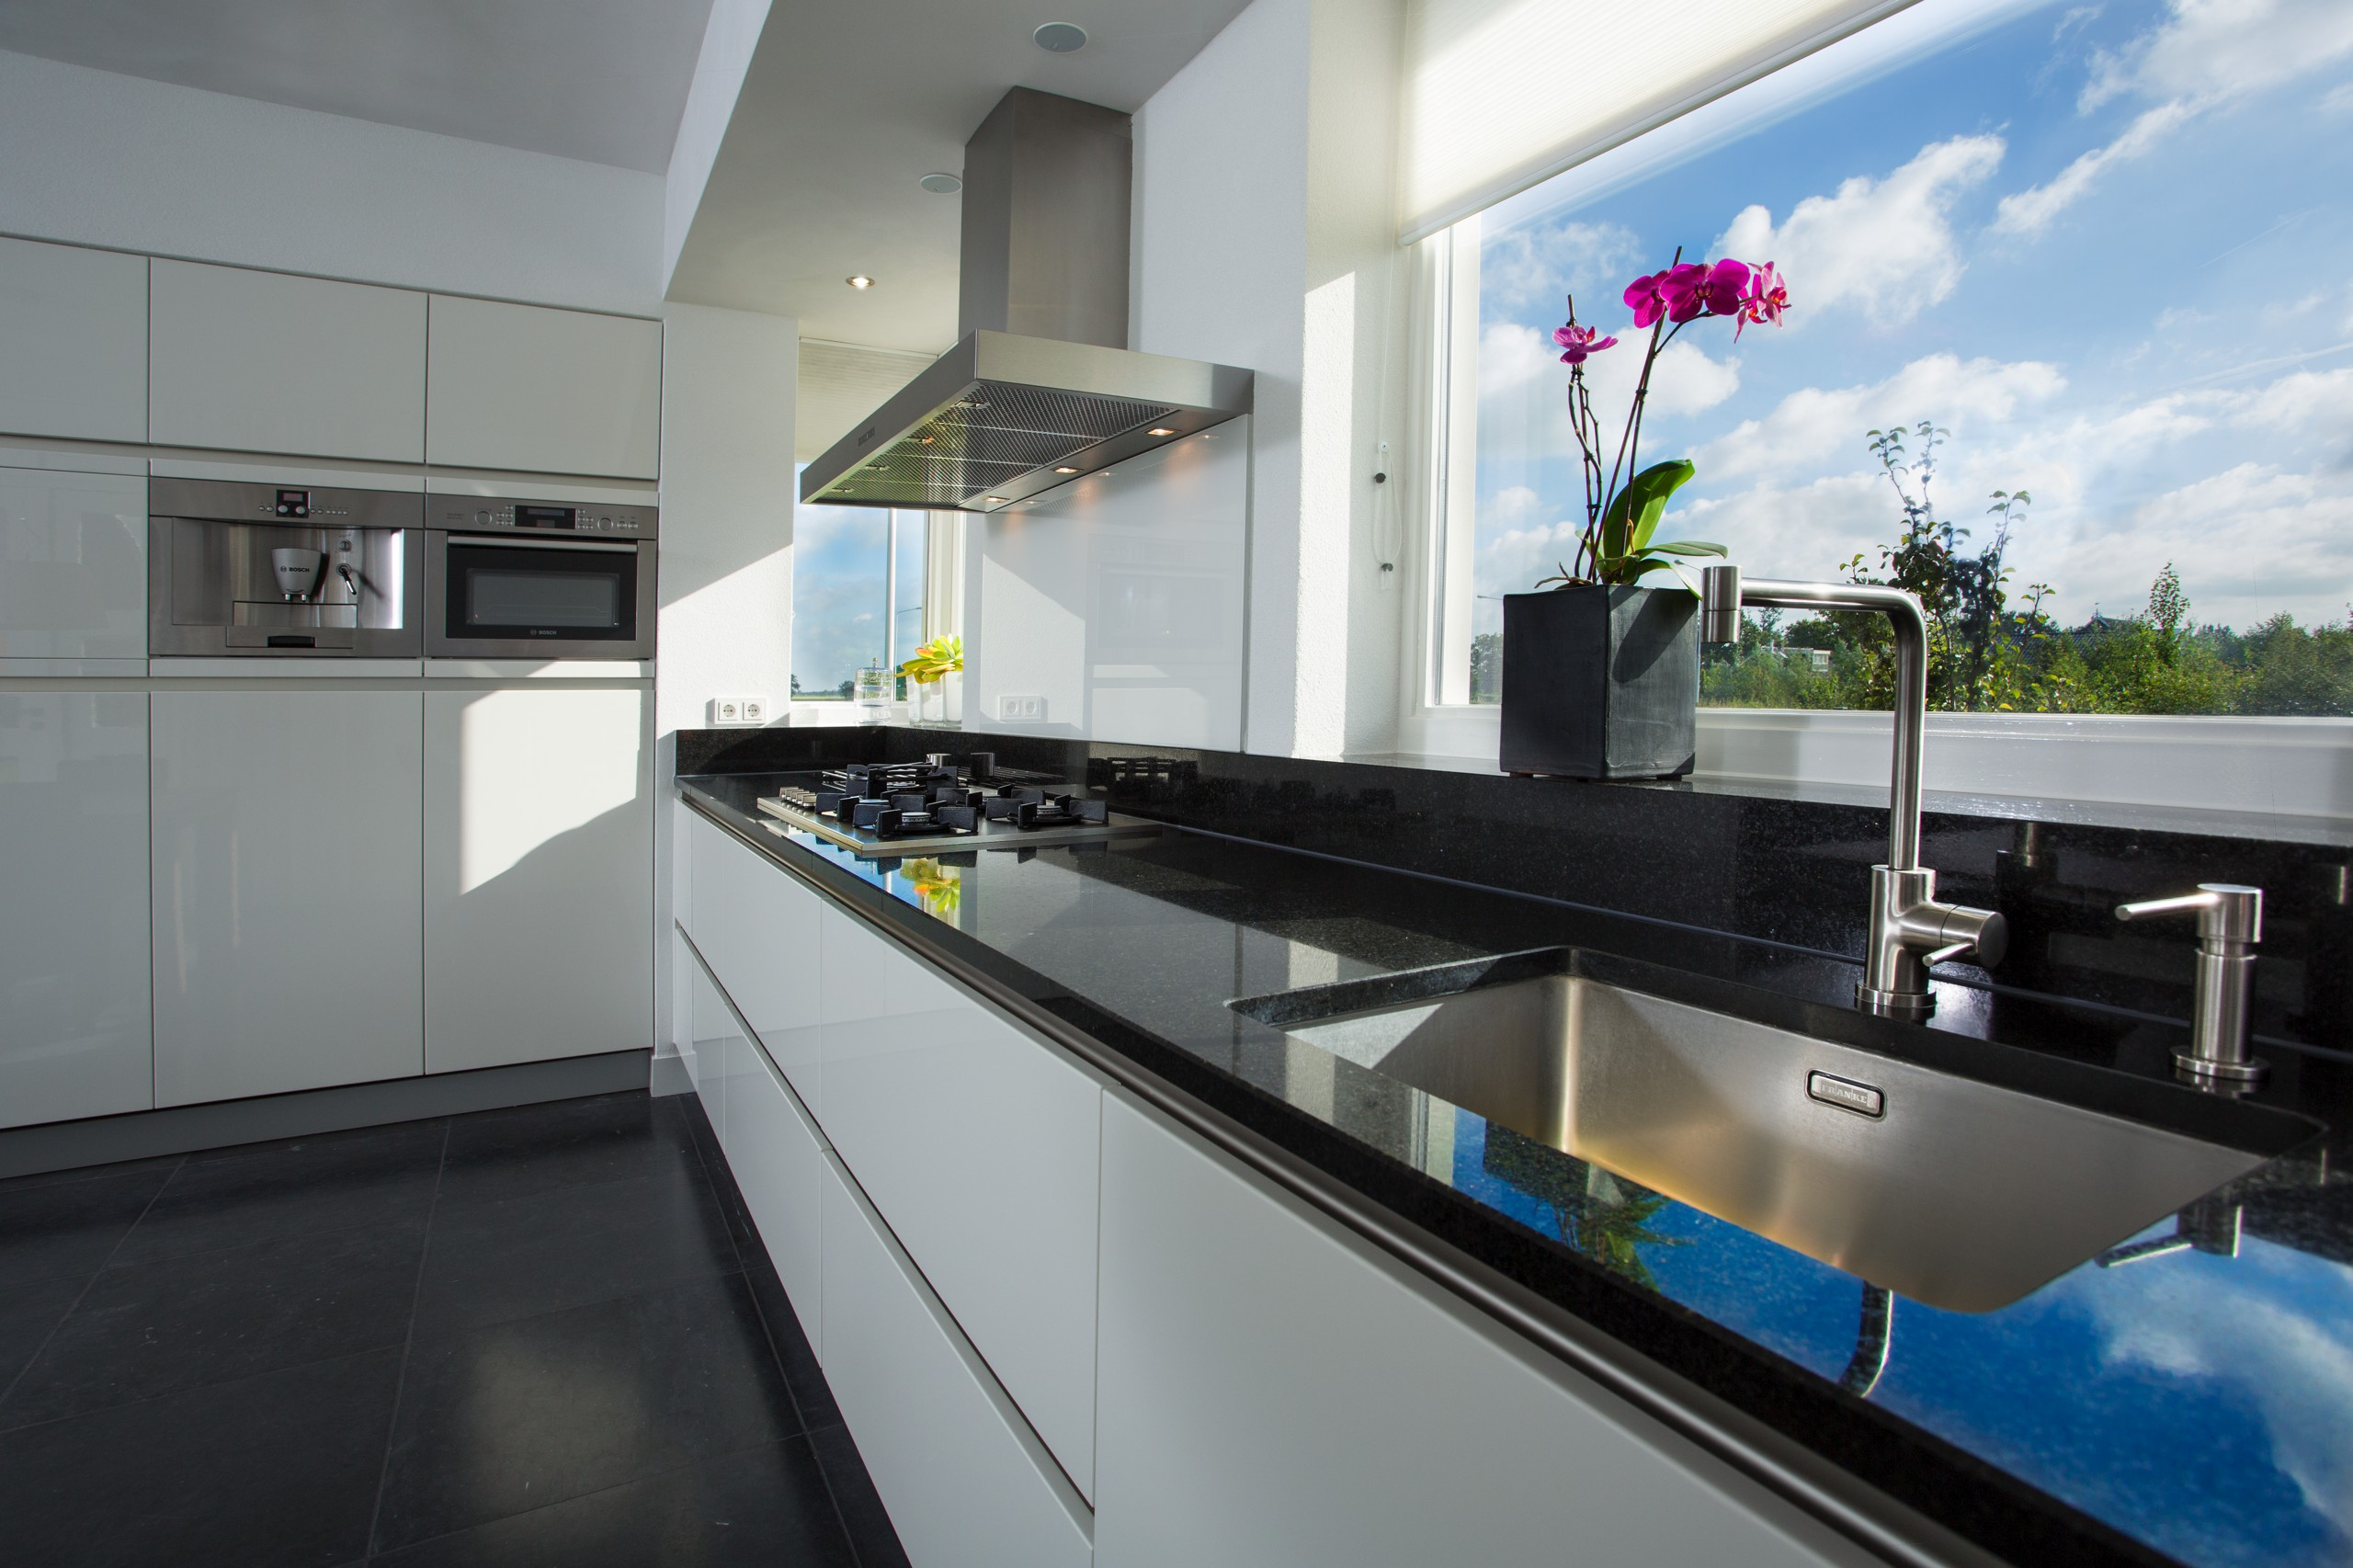 Keuken Greeploos Of Niet : witte greeploze keuken geplaatste keuken in zwaagwesteinde friesland